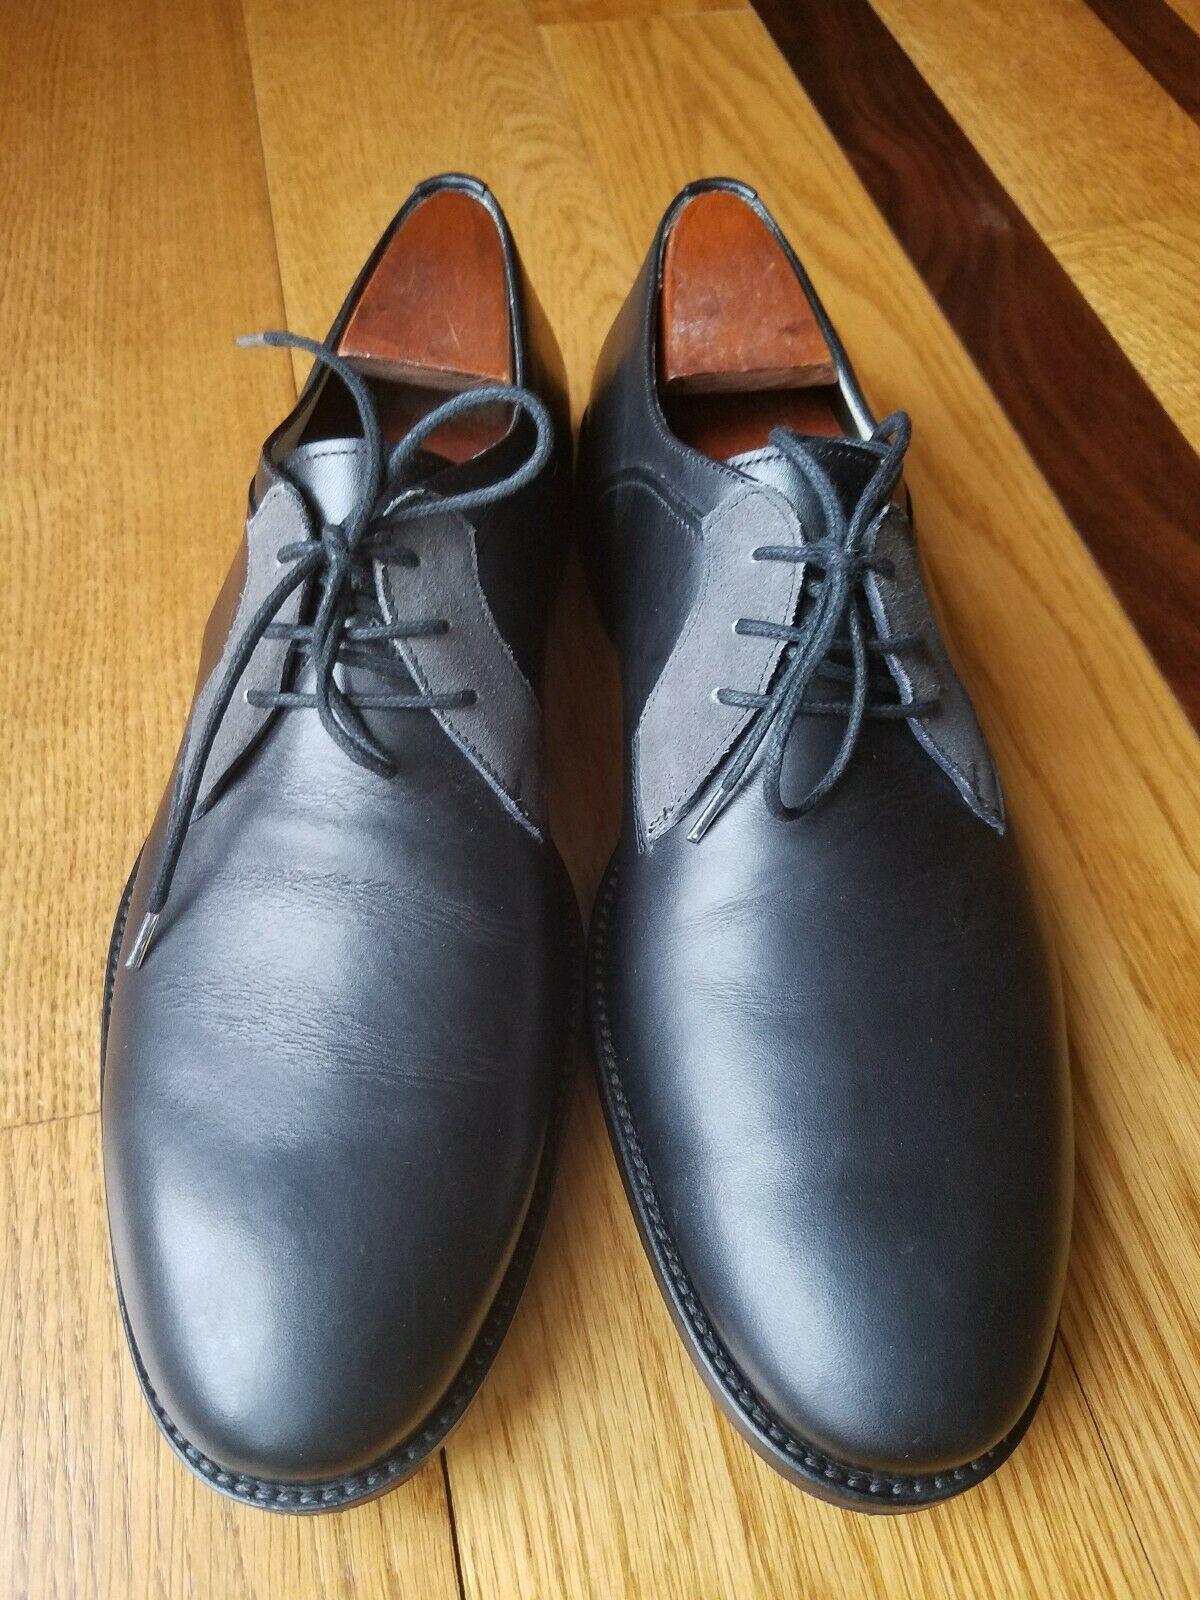 FRATELLI BORGIOLI Black Italian Leather Plain Toe Oxford shoes shoes shoes Size 8 Made  4cb638